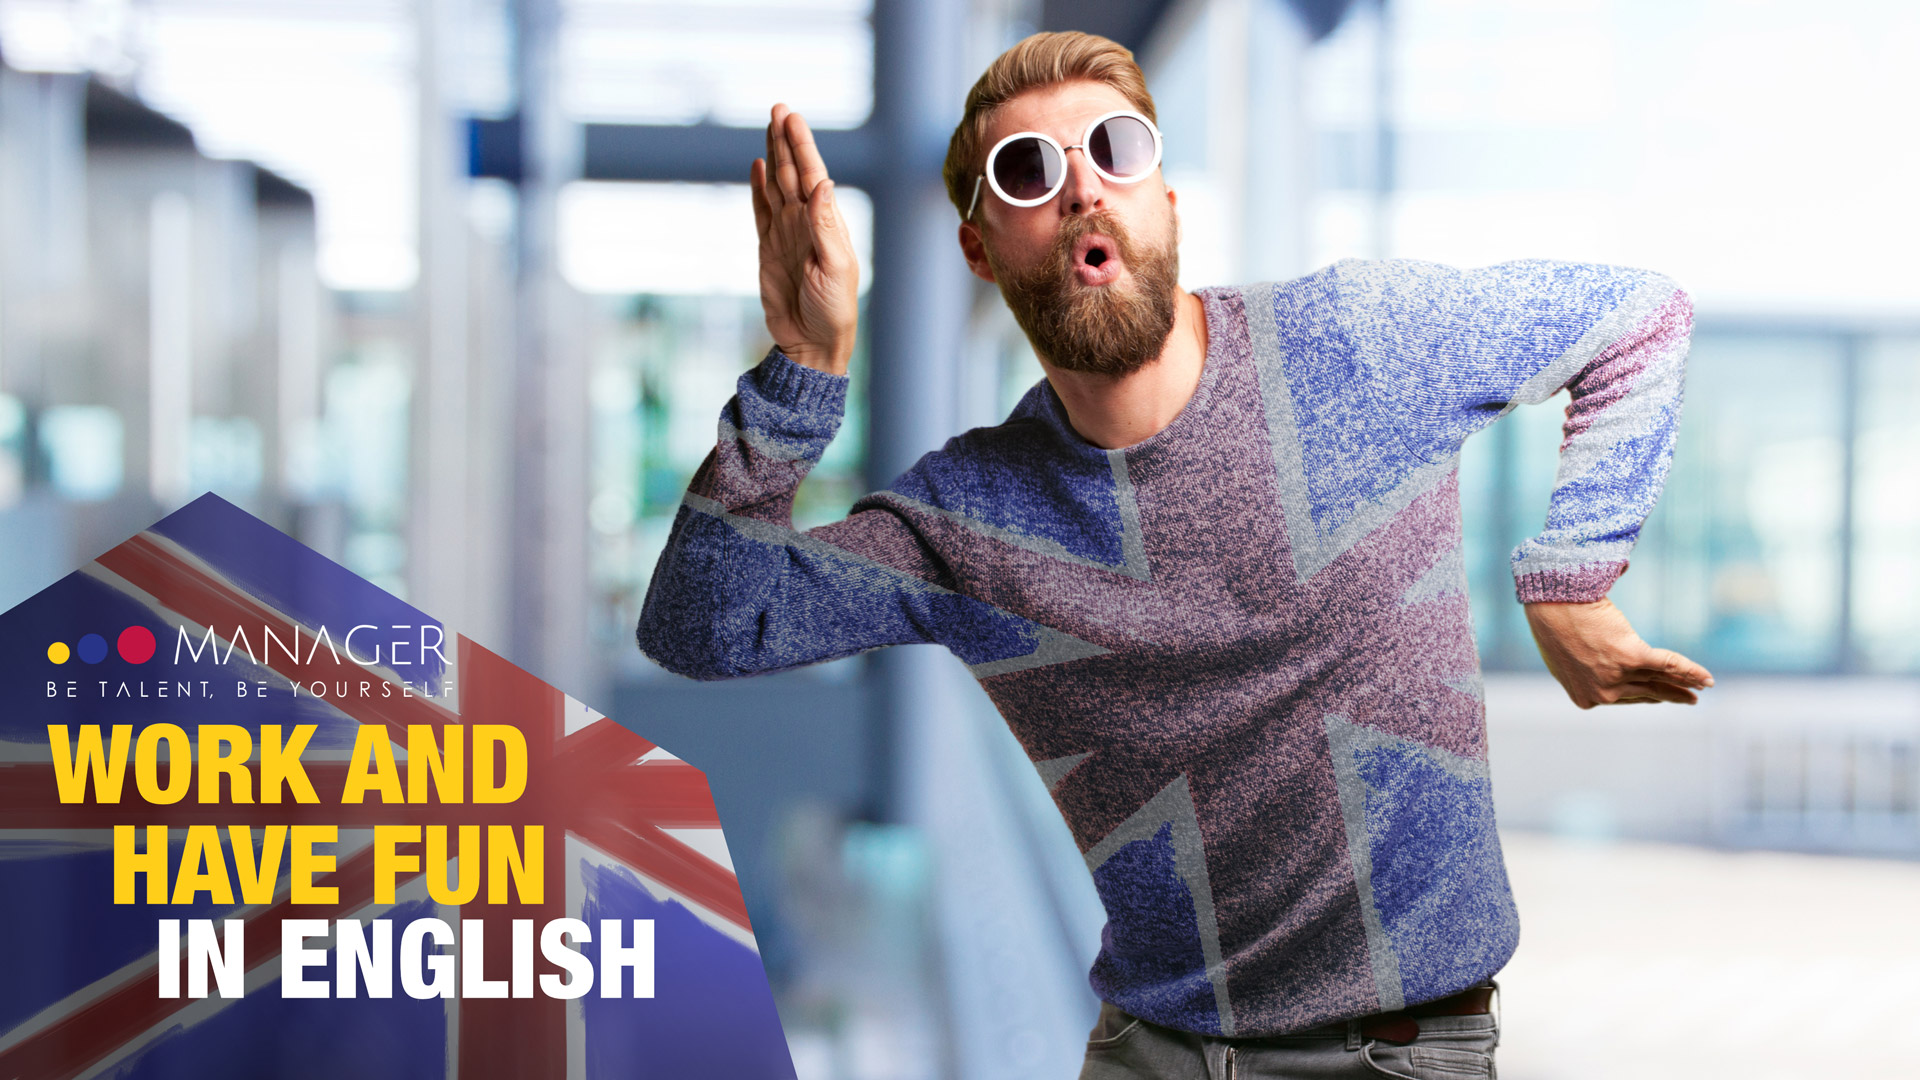 Work and have fun in English!